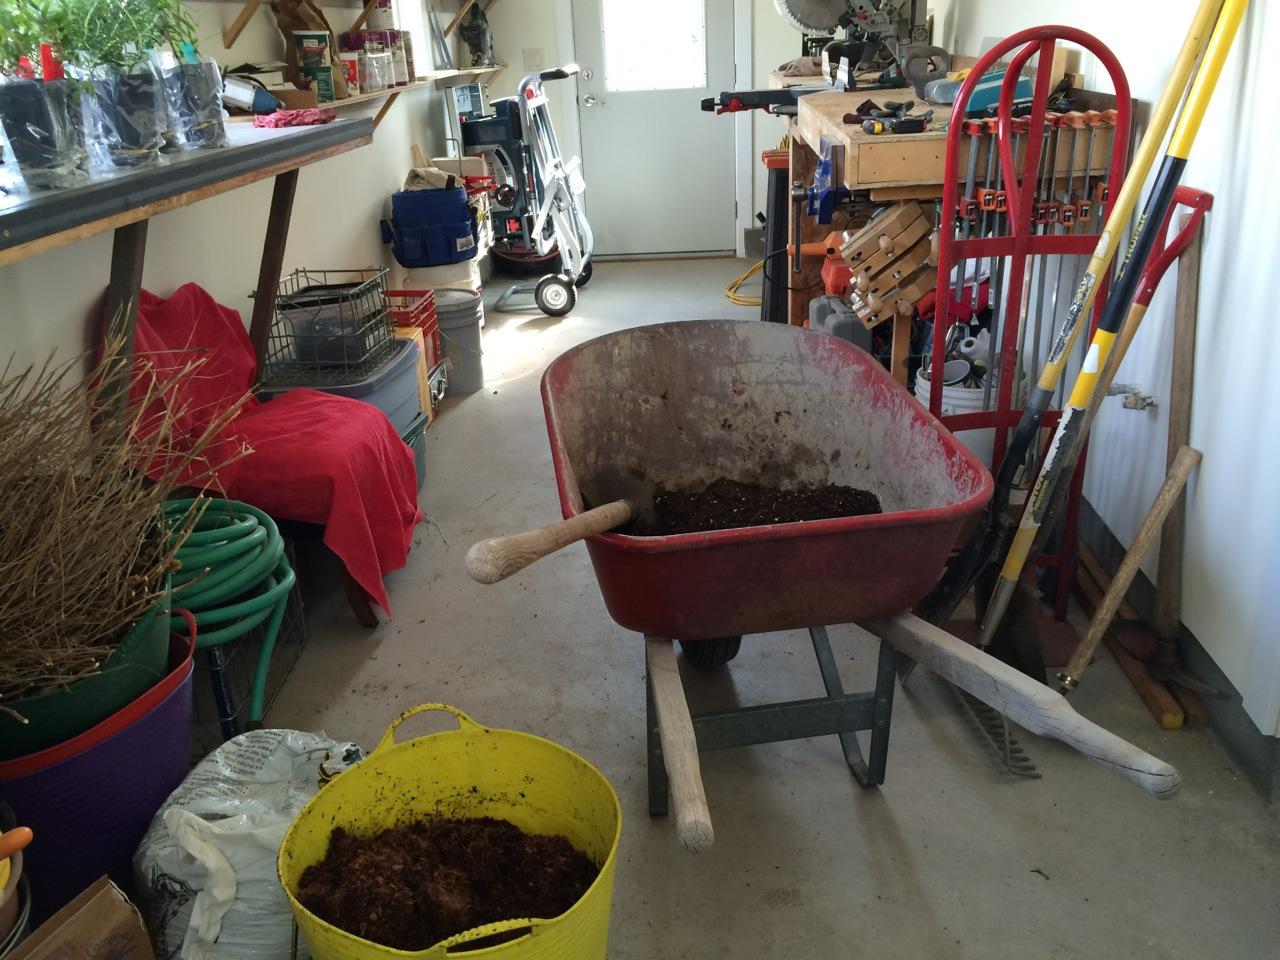 Mixing soil in the wheelbarrow in my sunny workshop.